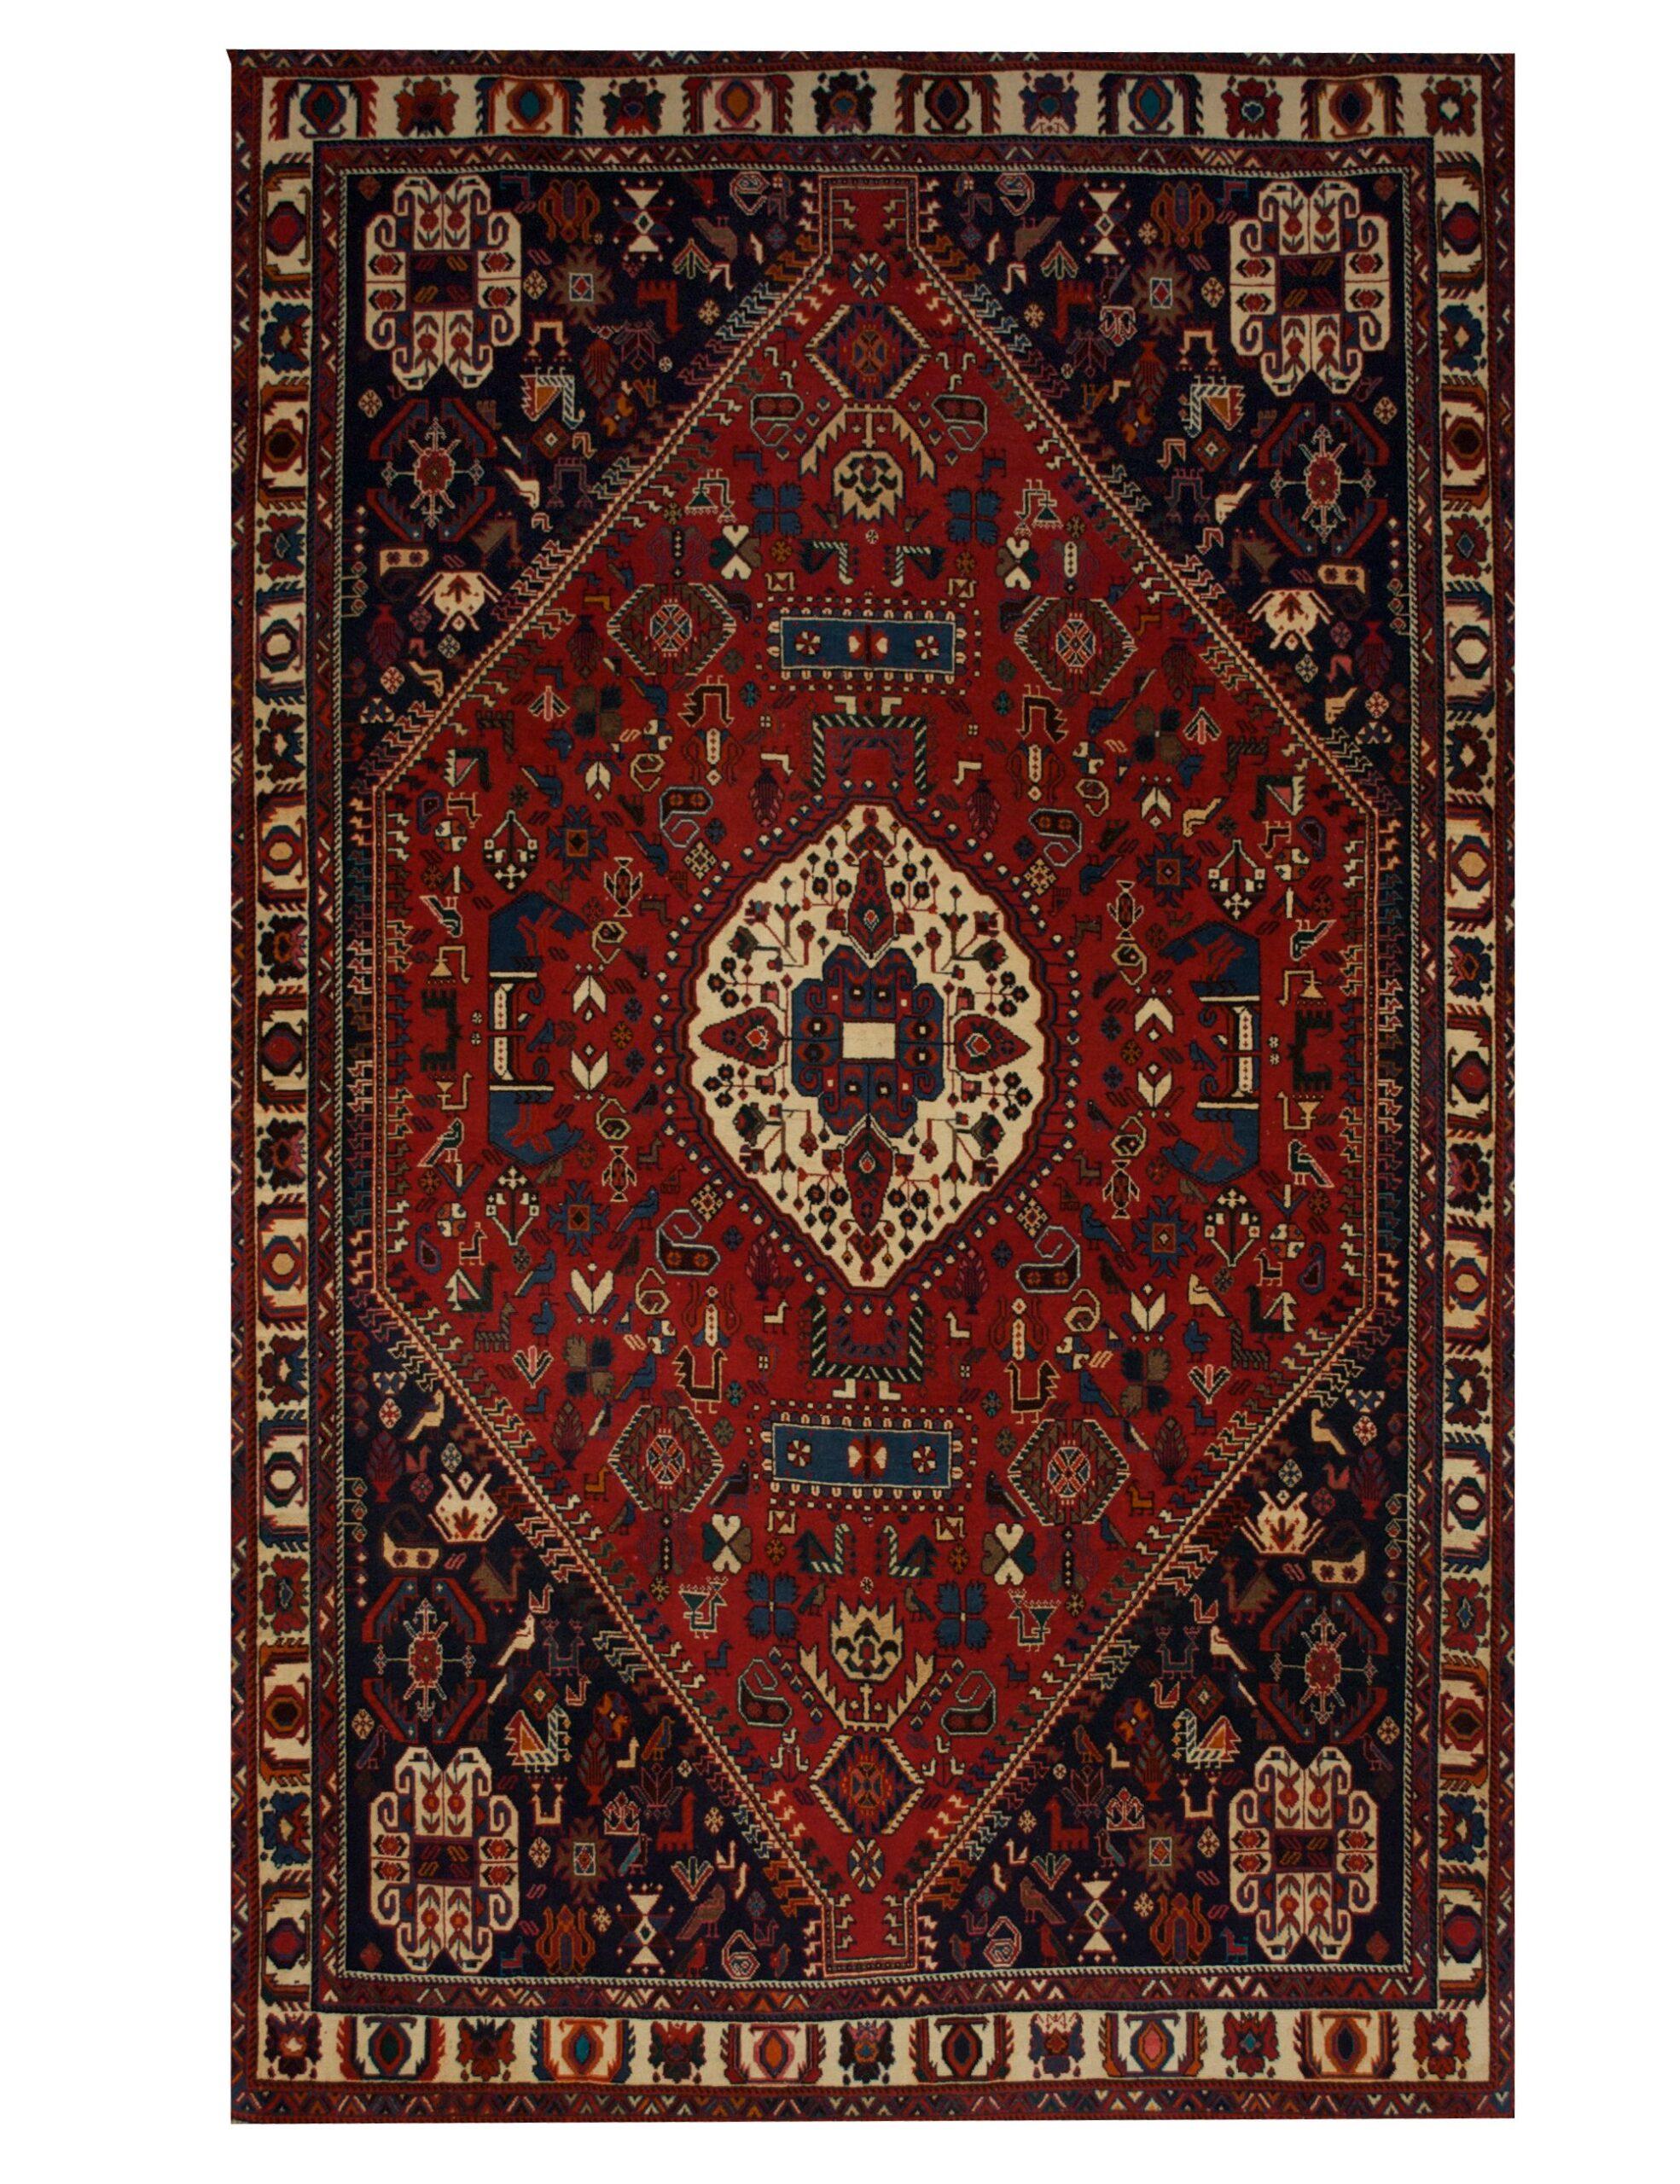 "Antique Persian Ghashghaei 5' 3"" x 8' 3"" Handmade Wool Area Rug - Shabahang Royal Carpet"